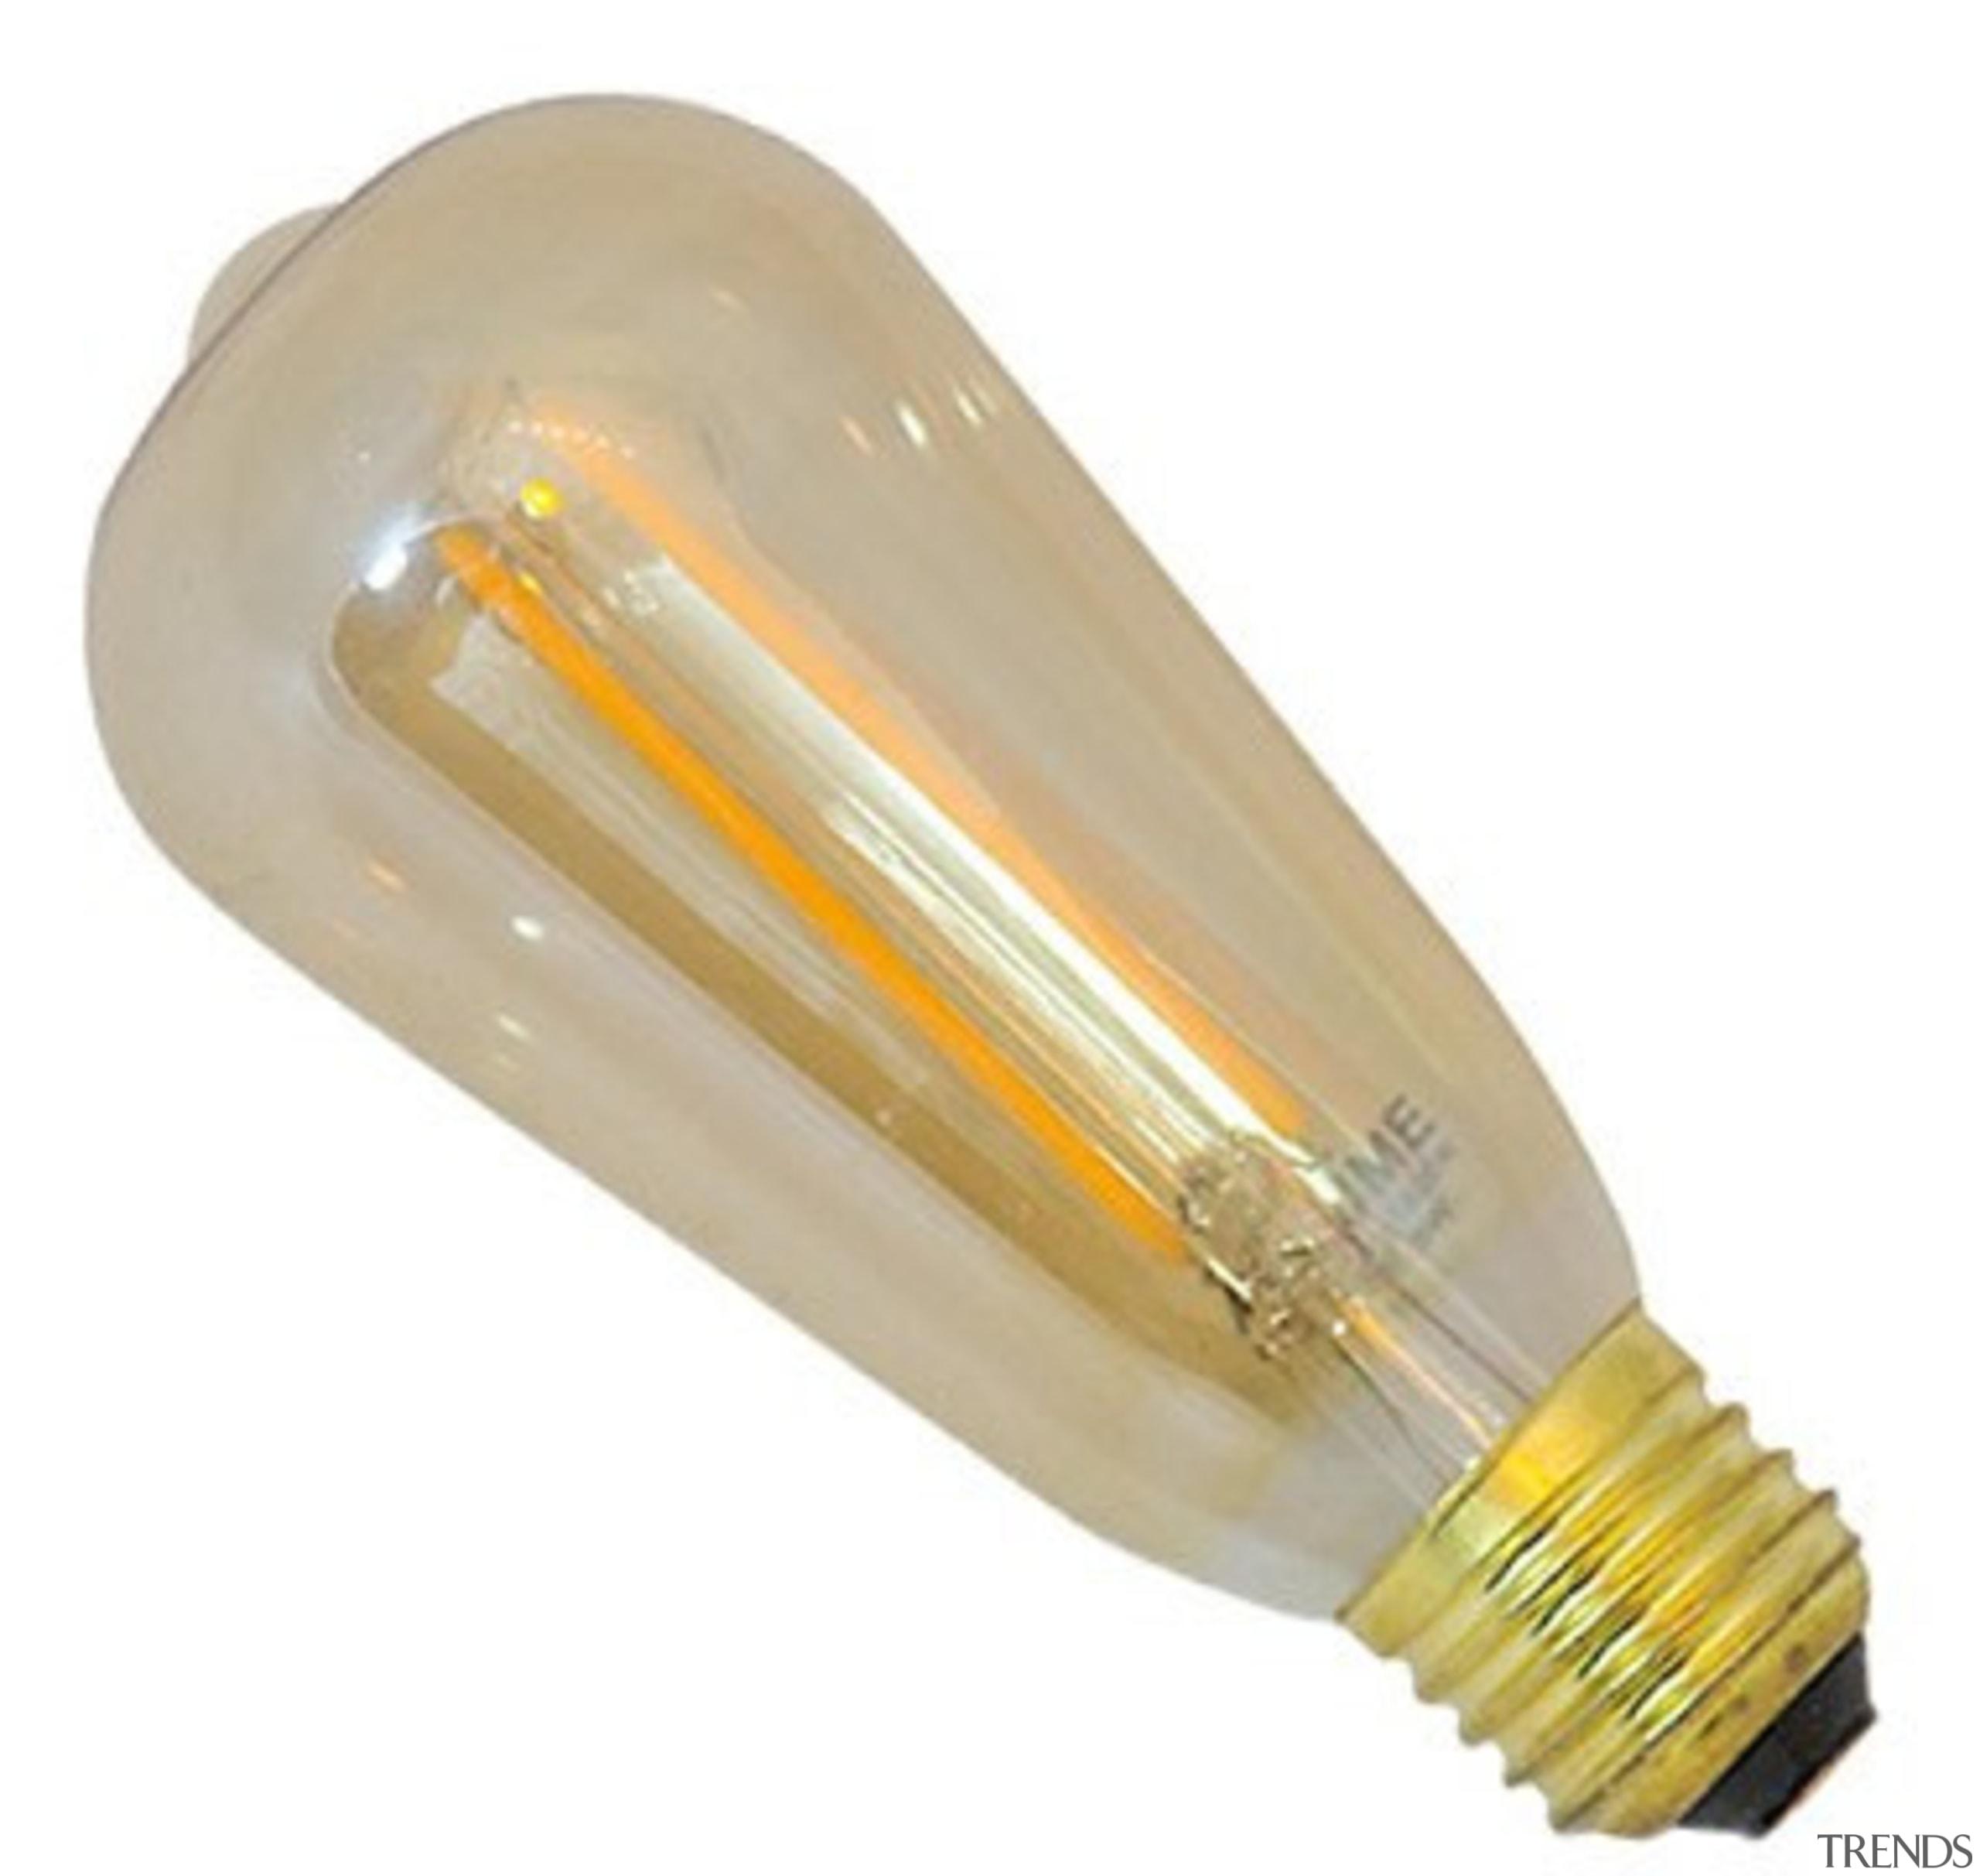 Features2.5W1800KAmber glassLuminous Flux: 180 lmEfficacy: 72 lm/wCRI ˃ white